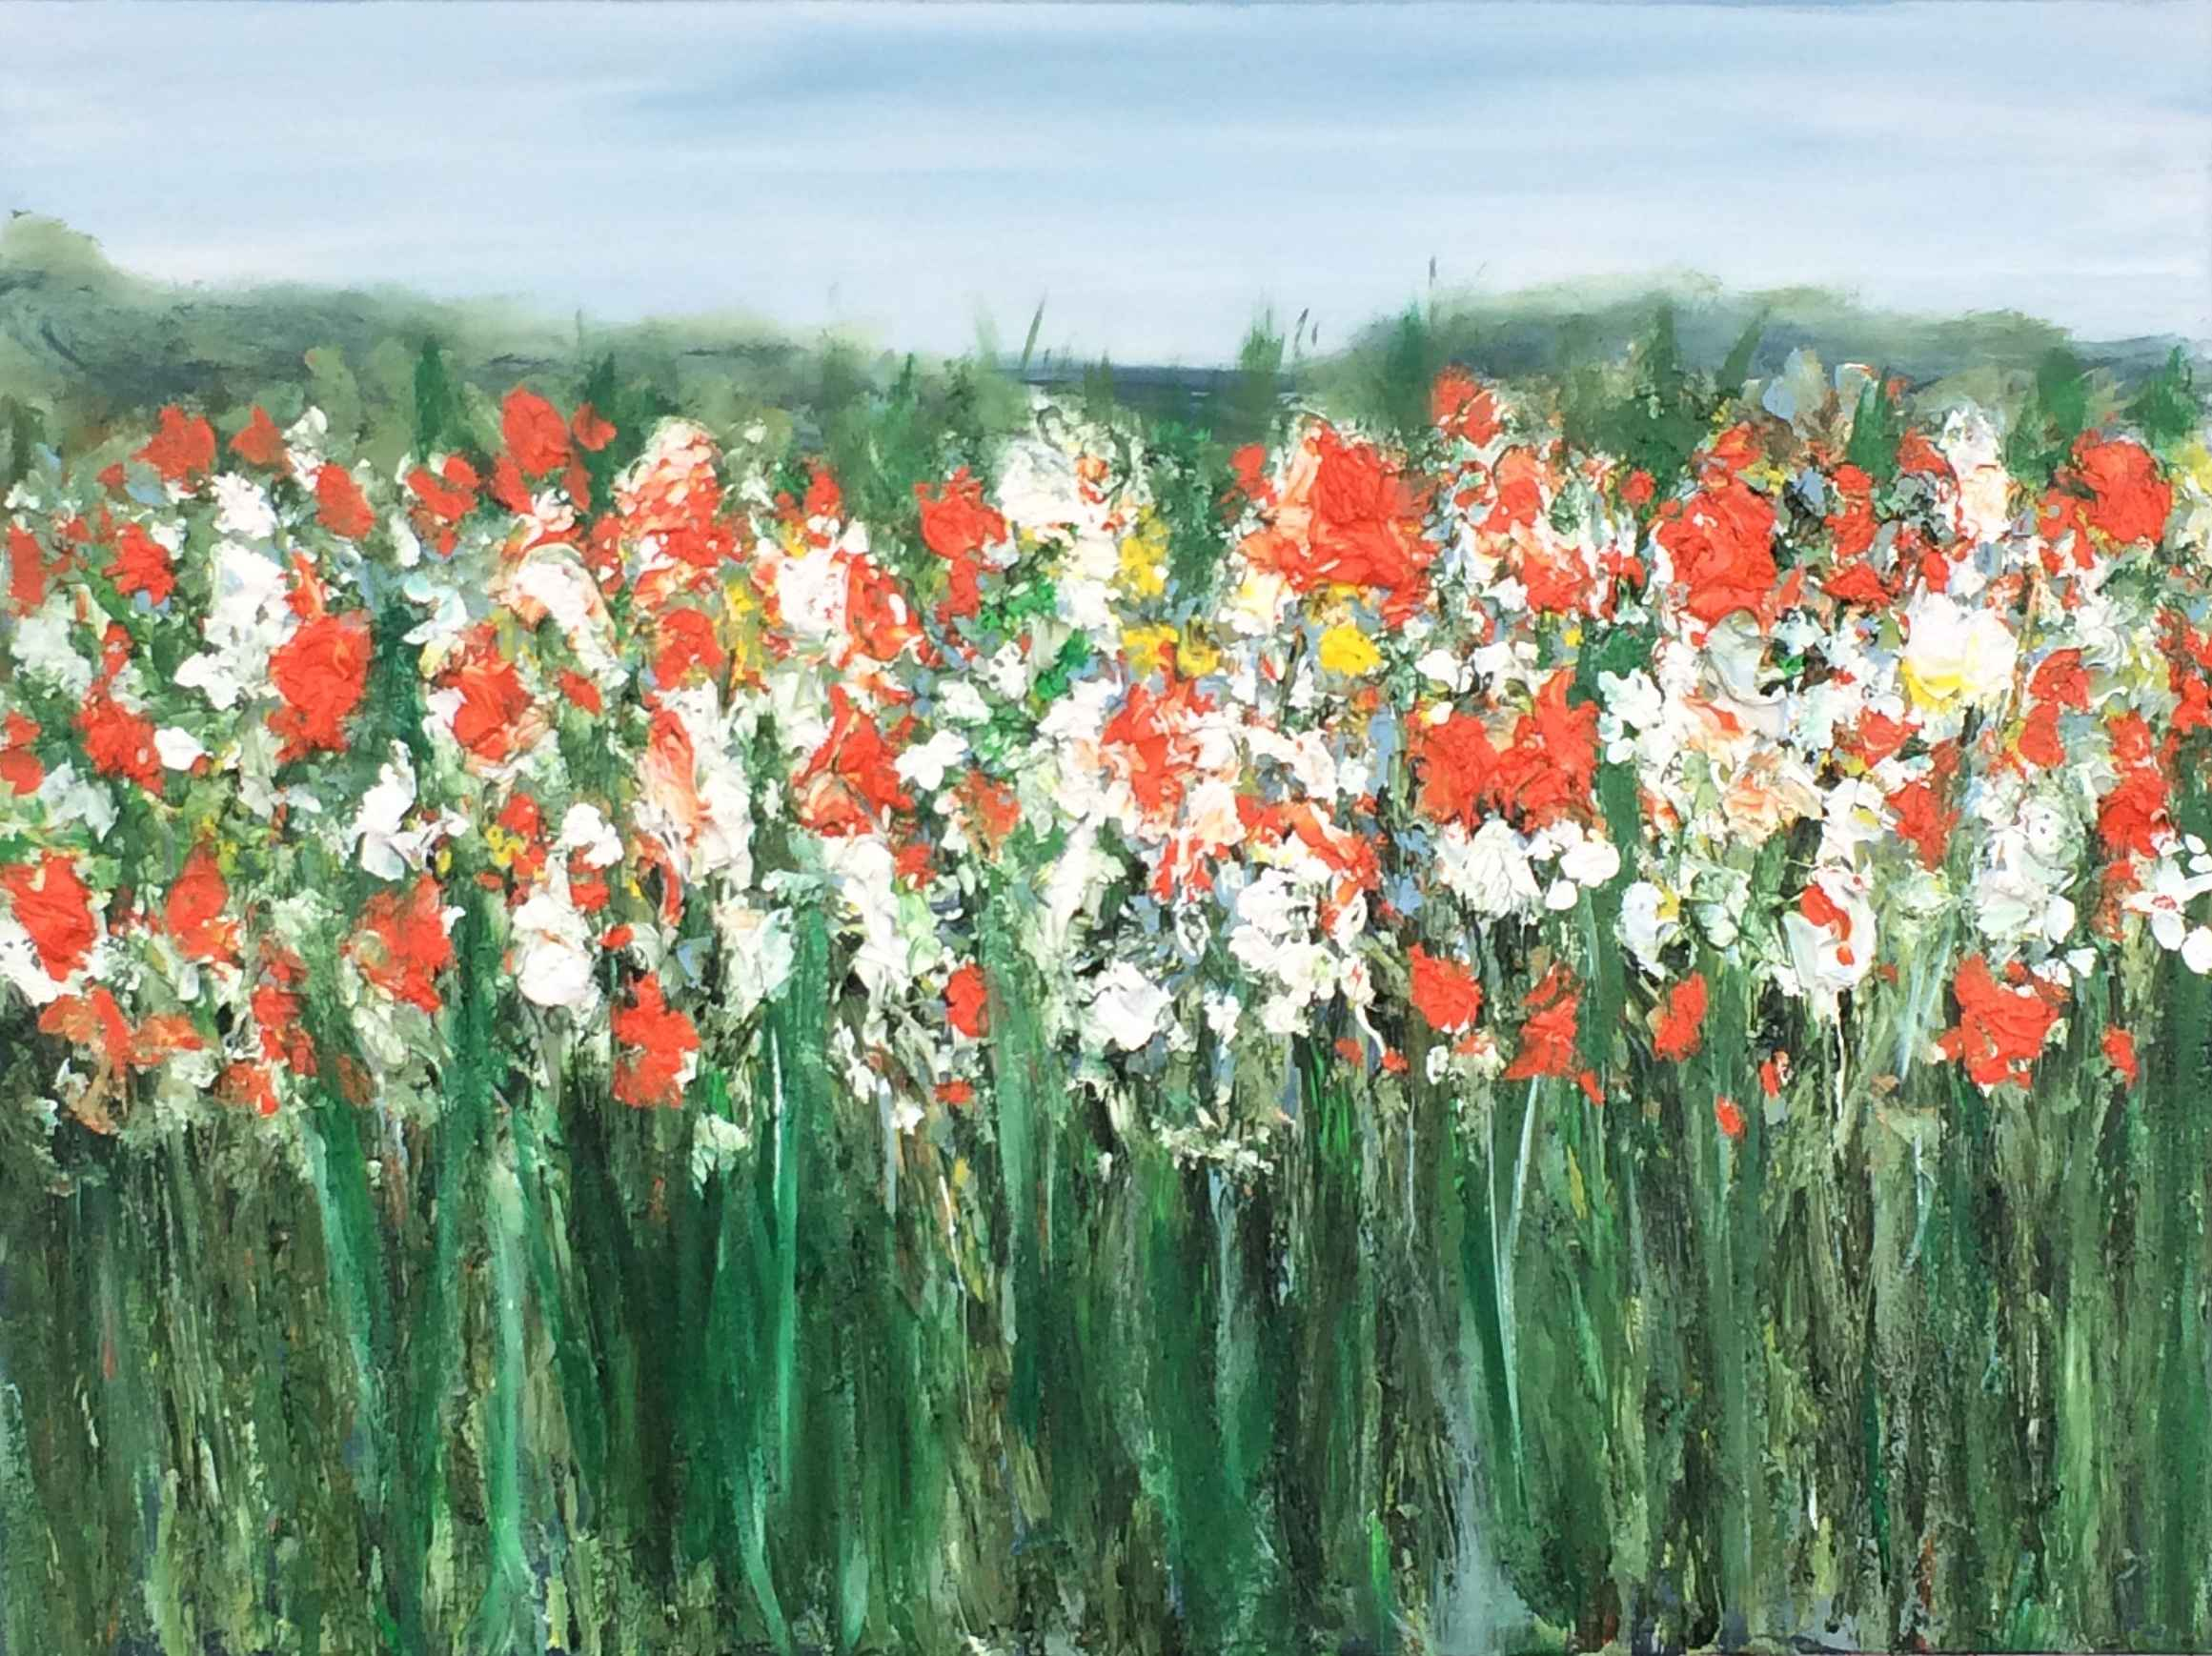 Summer Garden #2 by  Steve Lyons - Masterpiece Online